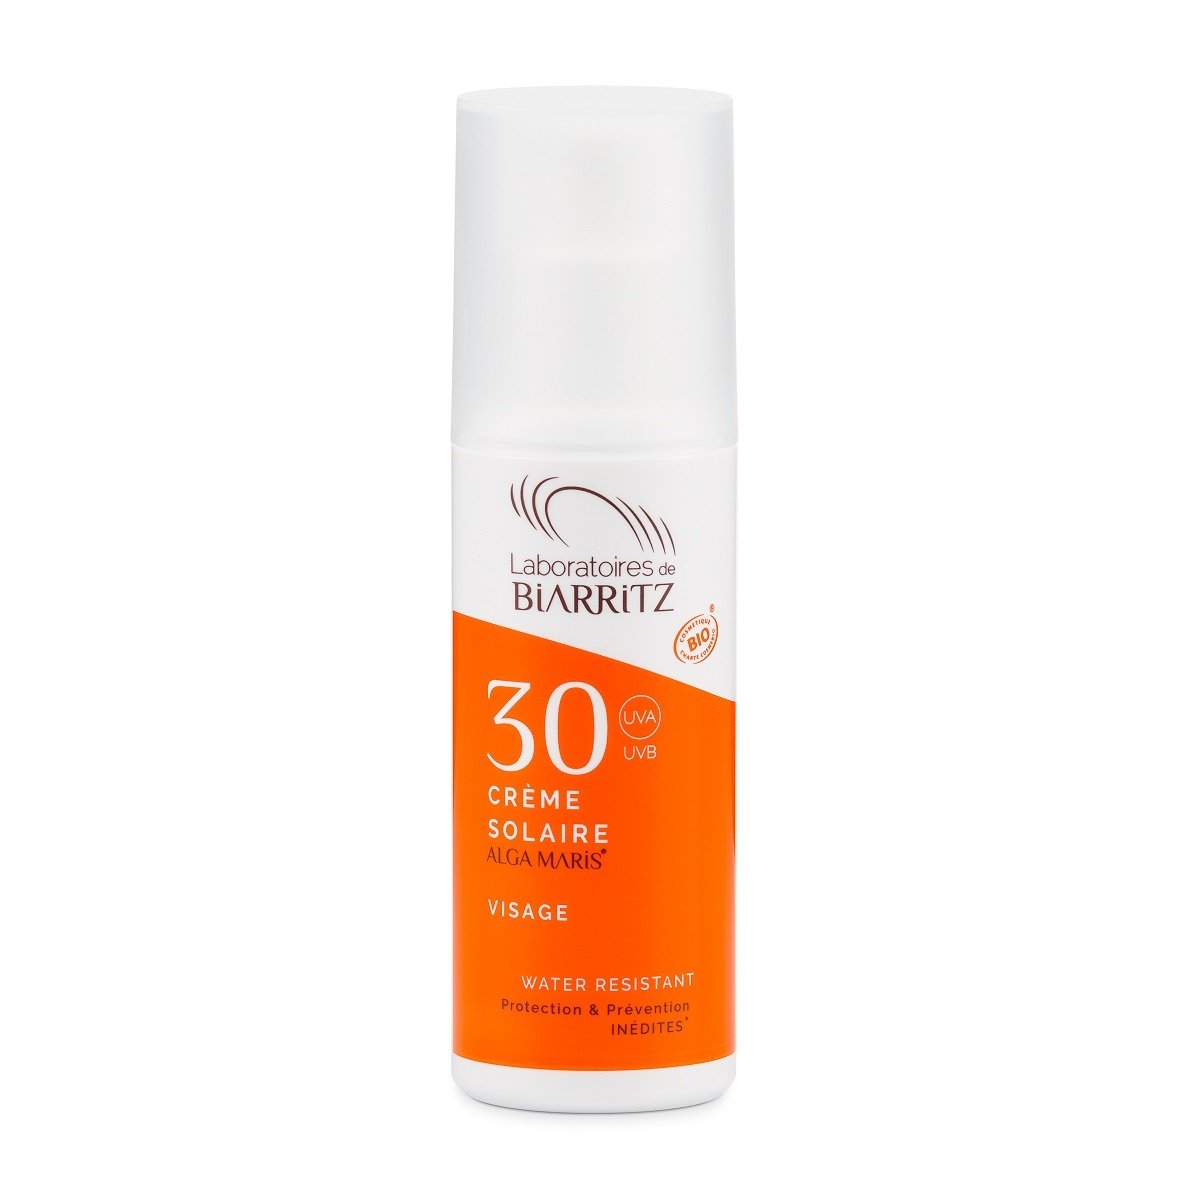 algamaris Certified Organic Sunscreen Face Cream SPF30 3760211480035